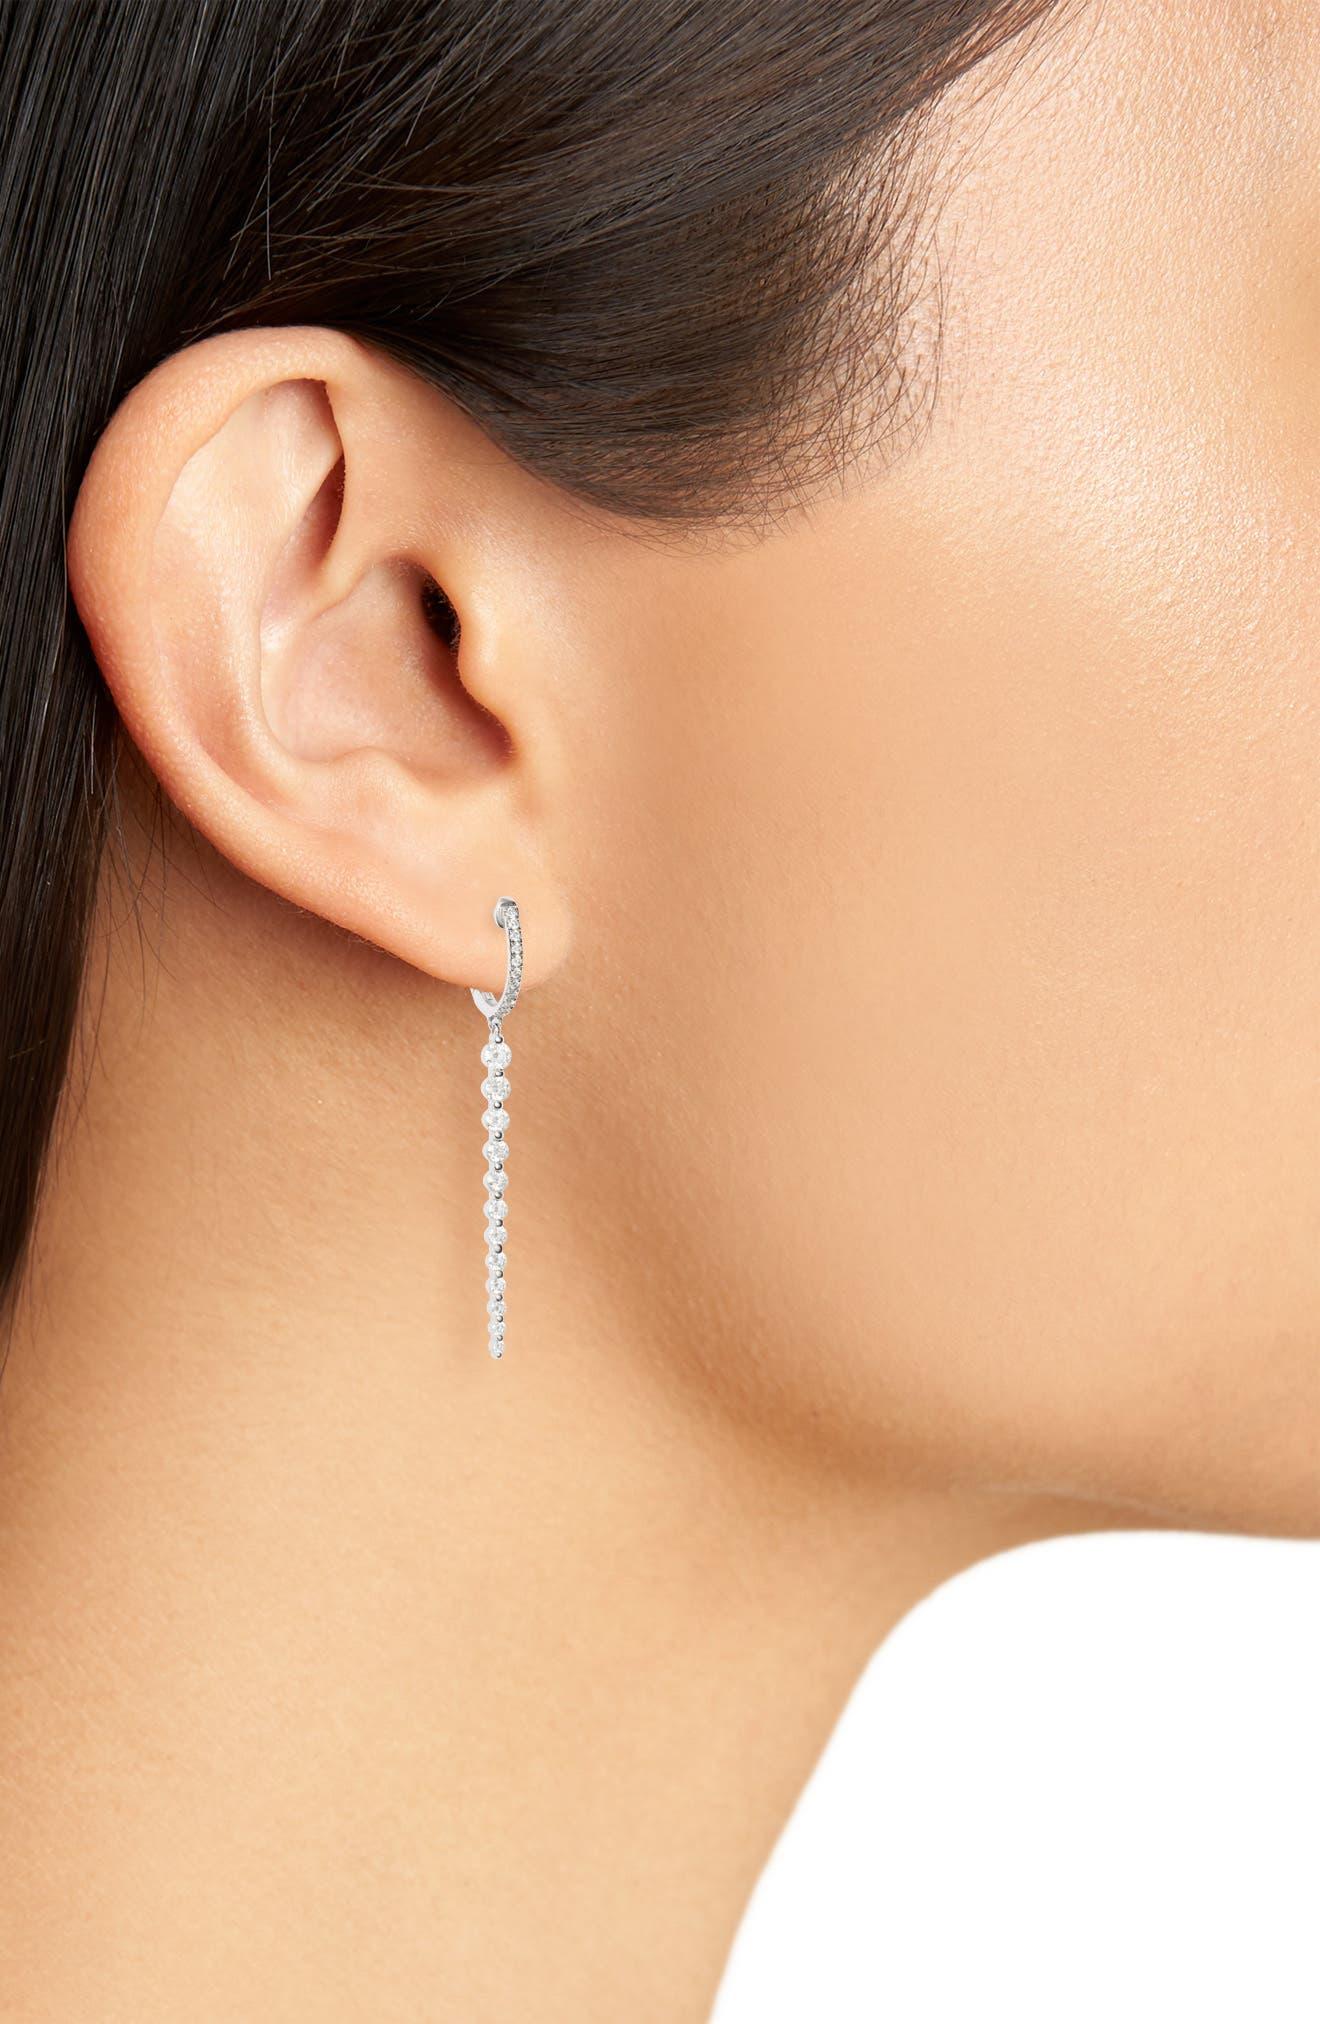 Getty Linear Diamond Earrings,                             Alternate thumbnail 2, color,                             WHITE GOLD/ DIA